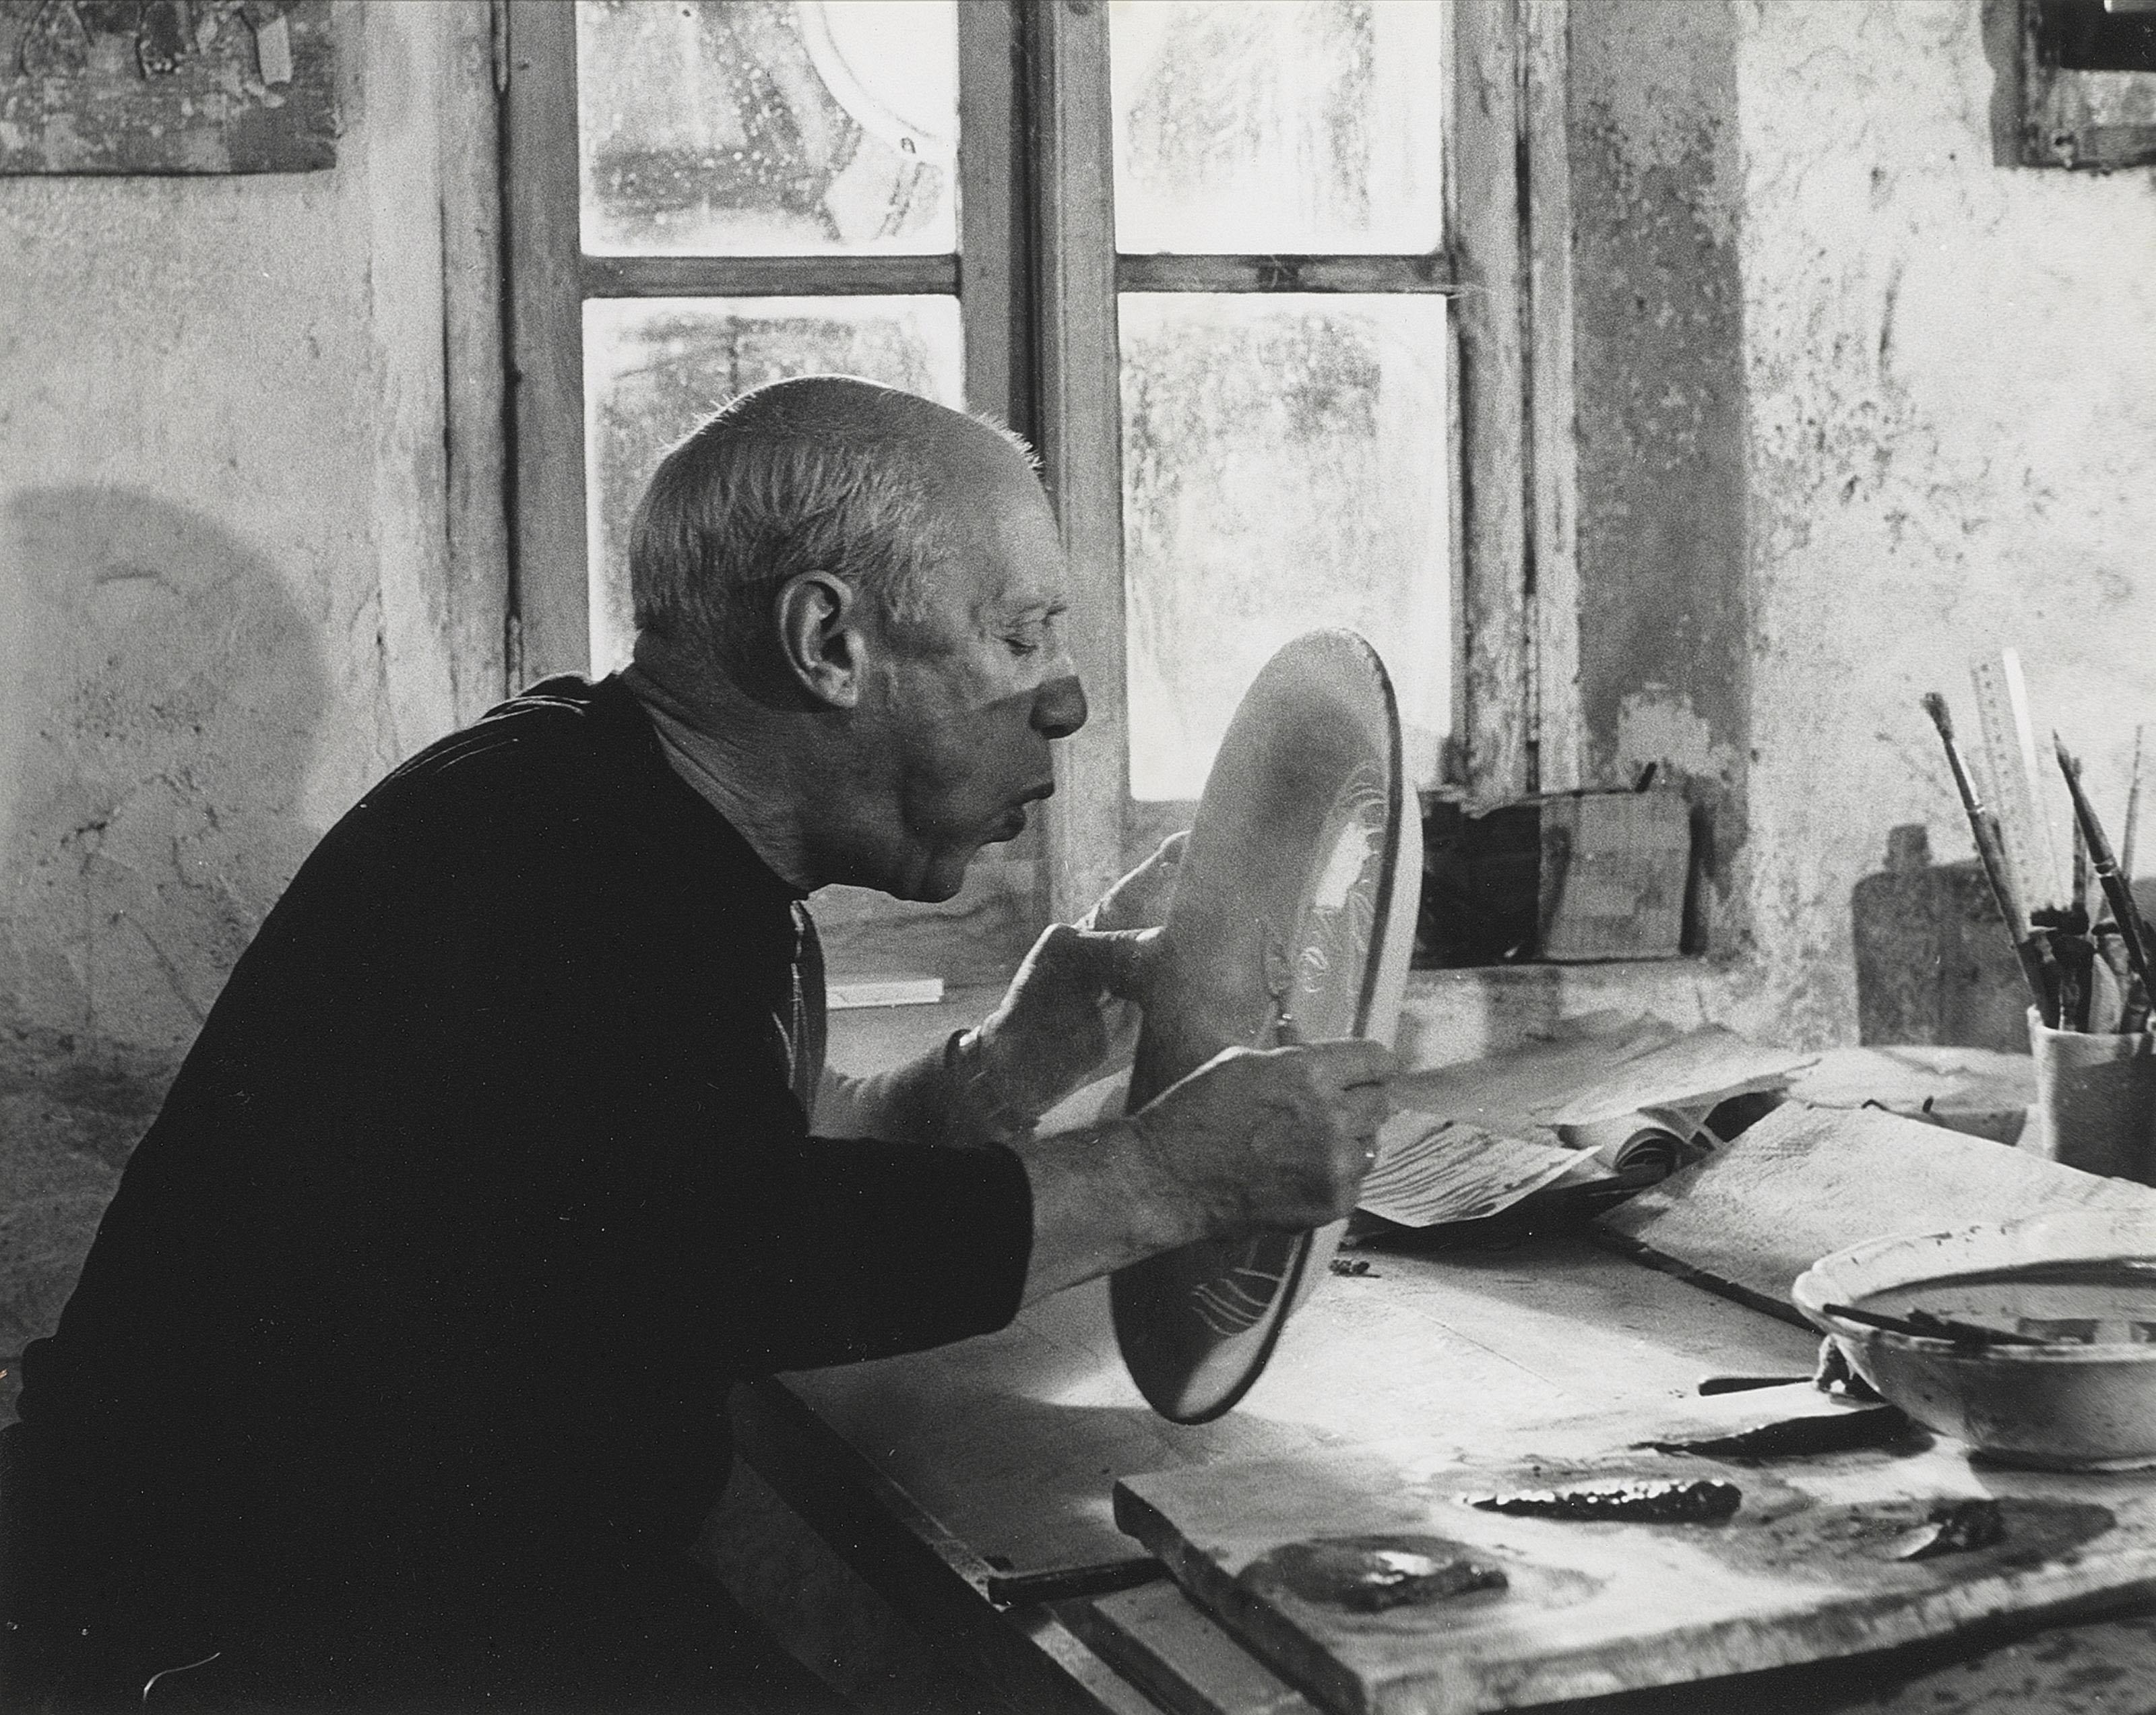 Untitled, 1965